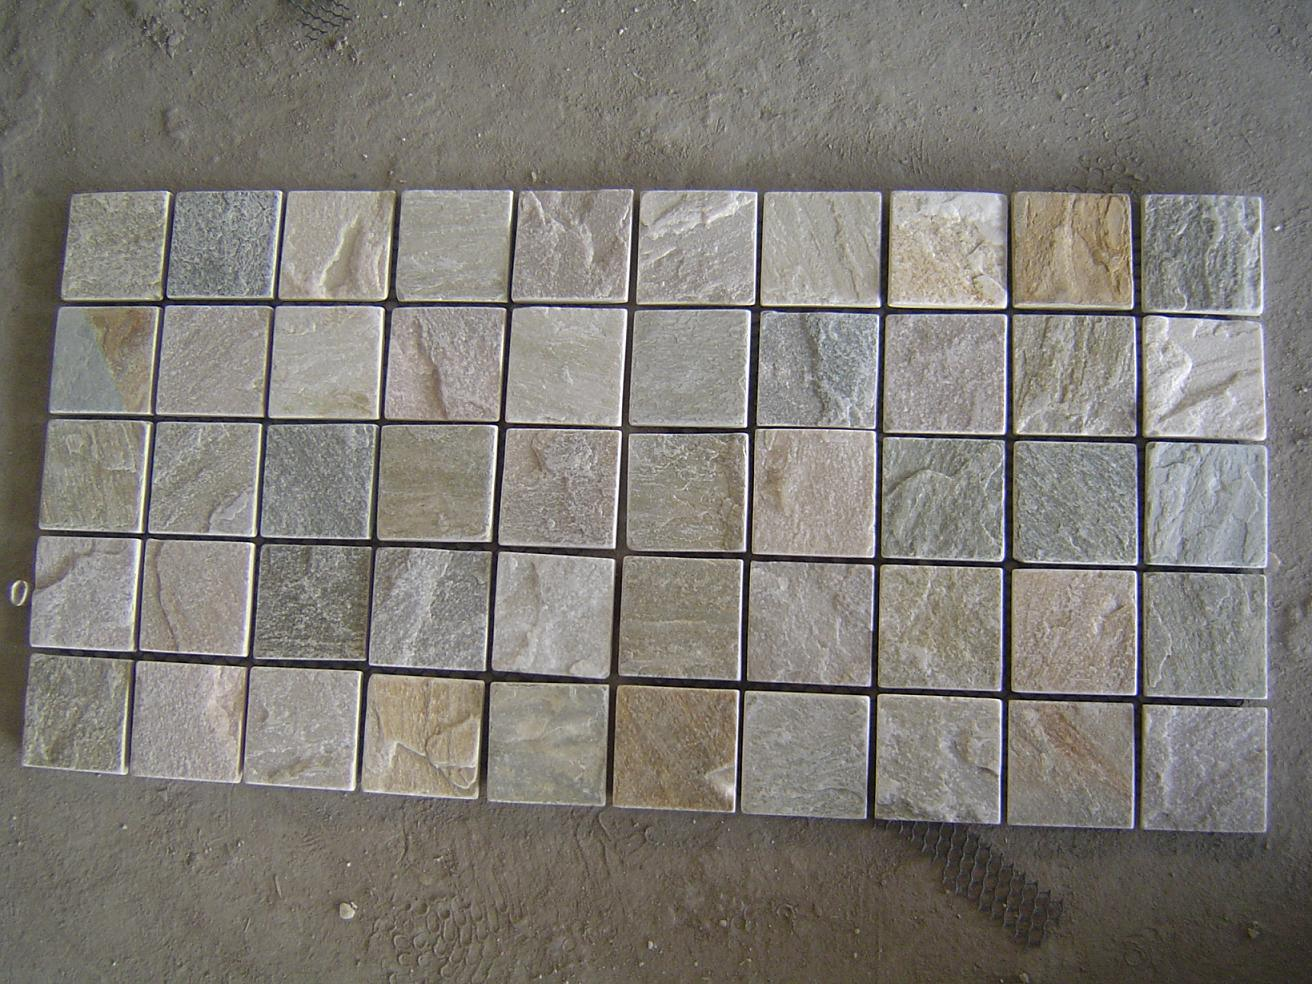 China Mosaic Tiles Zfm014 China Mosaic Mosaic Tiles